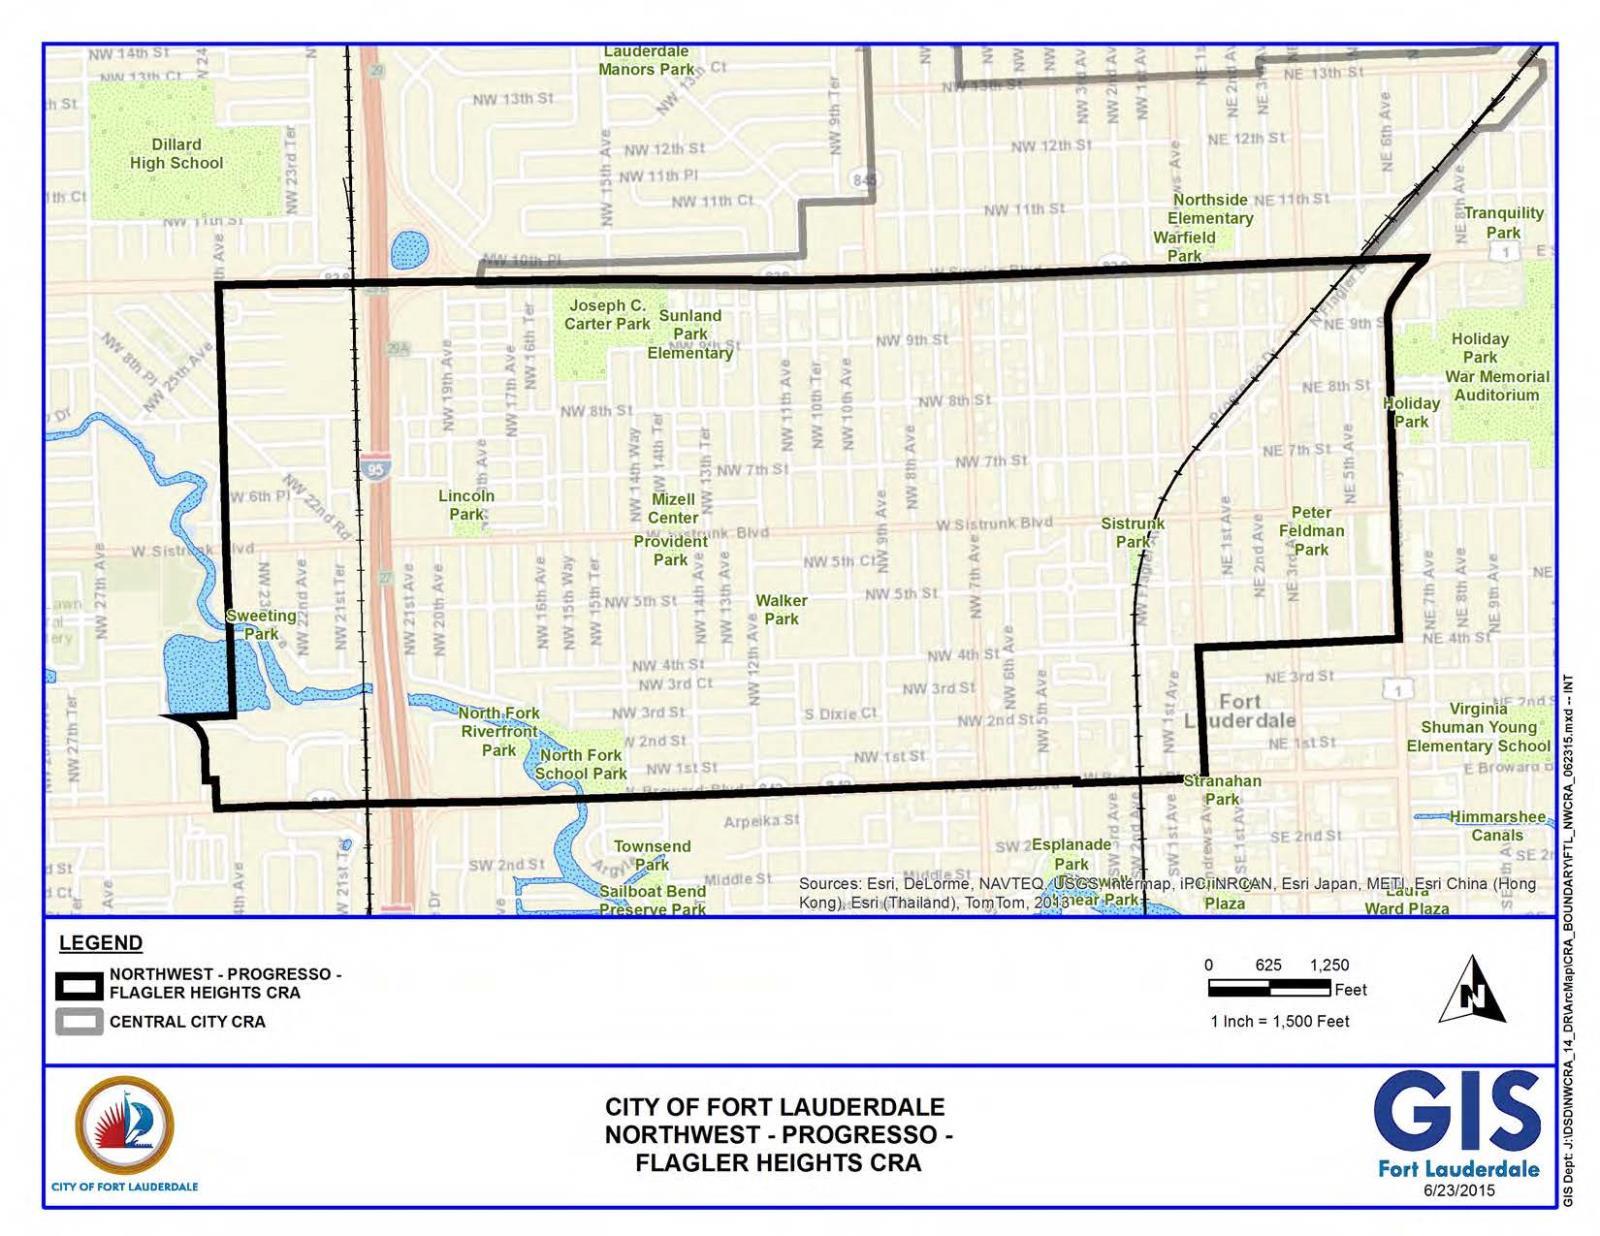 Fort Lauderdale Map Florida.City Of Fort Lauderdale Fl Npf Cra Boundary Map